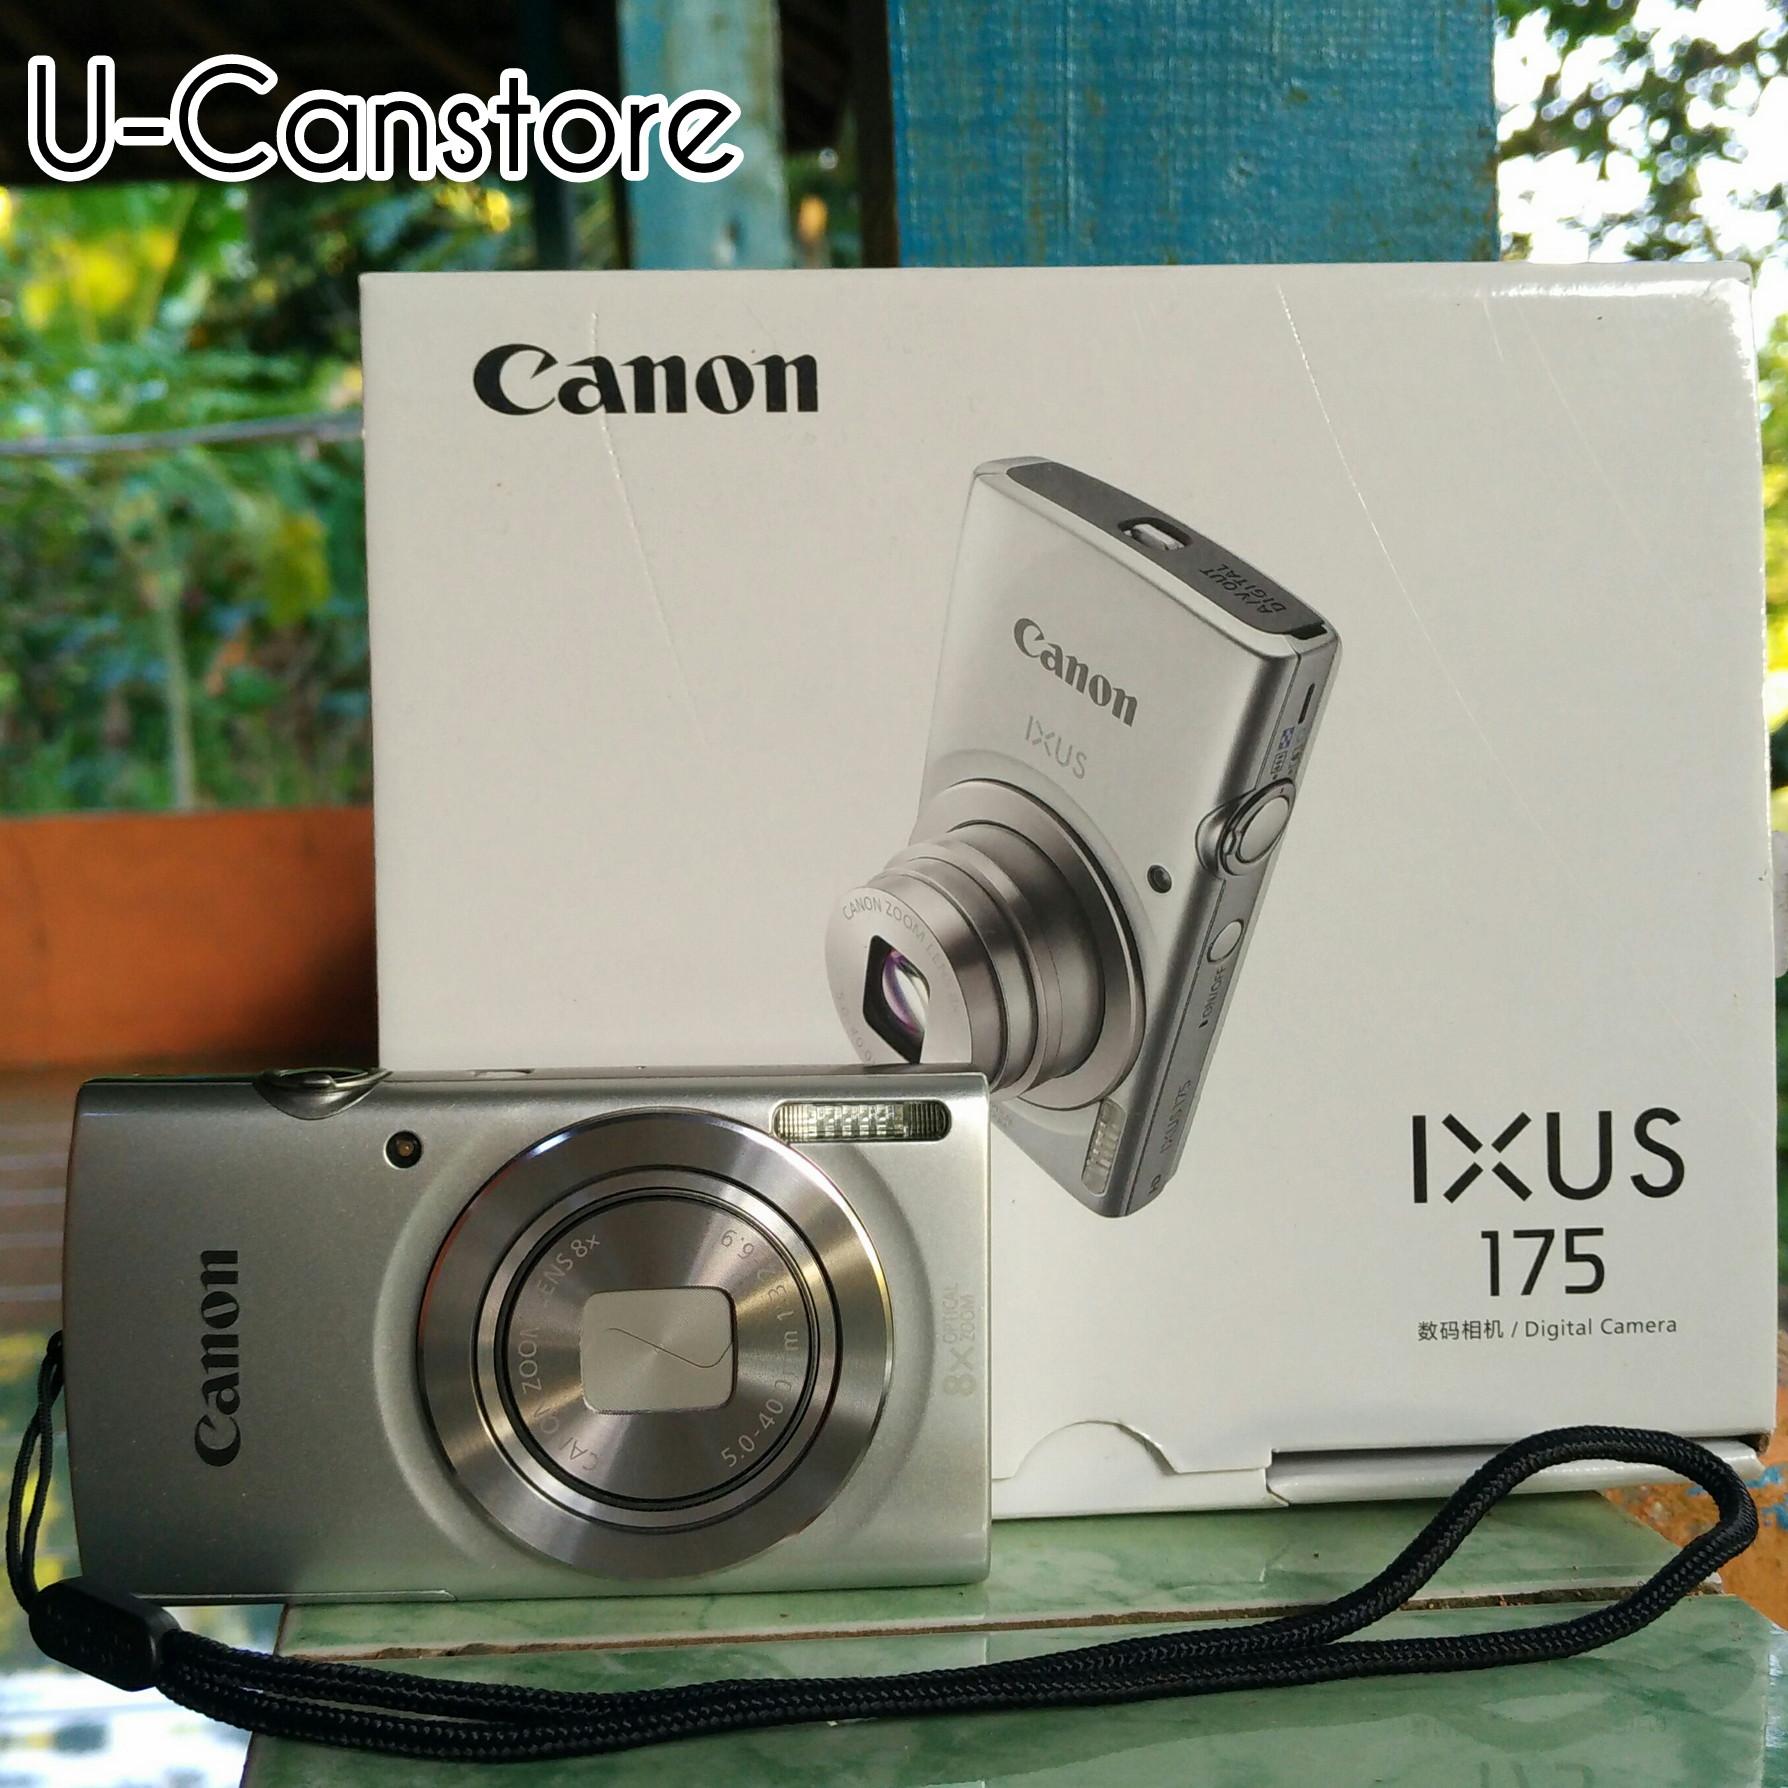 Jual Kamera Digital Canon IXUS 175 20MP 8X Optical Zoom Second U Canstore